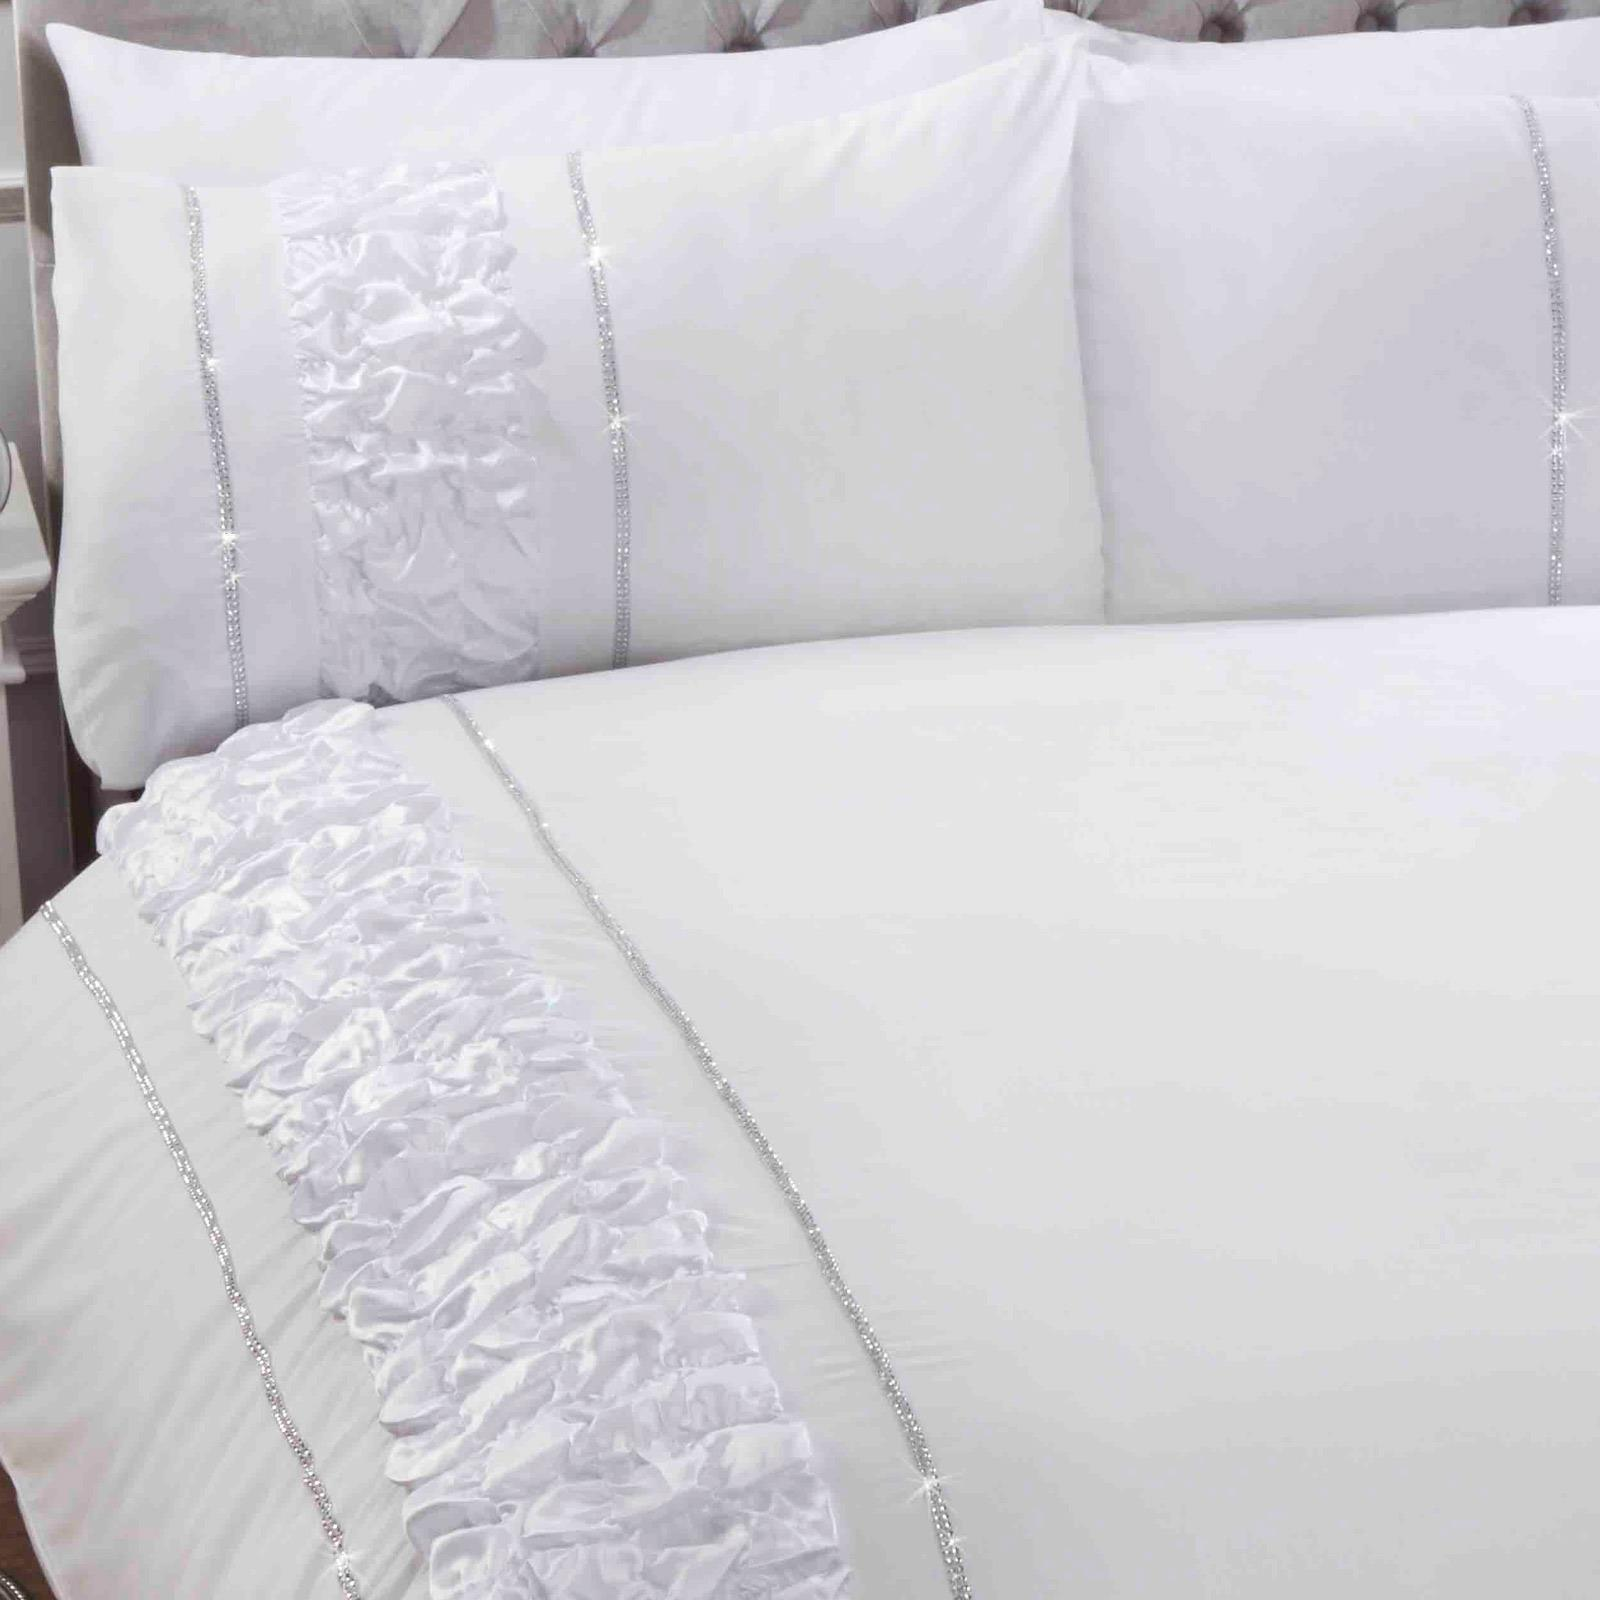 Blanco-Fundas-nordicas-Provence-Sparkle-Bling-Diamante-cubierta-del-edredon-conjuntos-de-cama miniatura 4